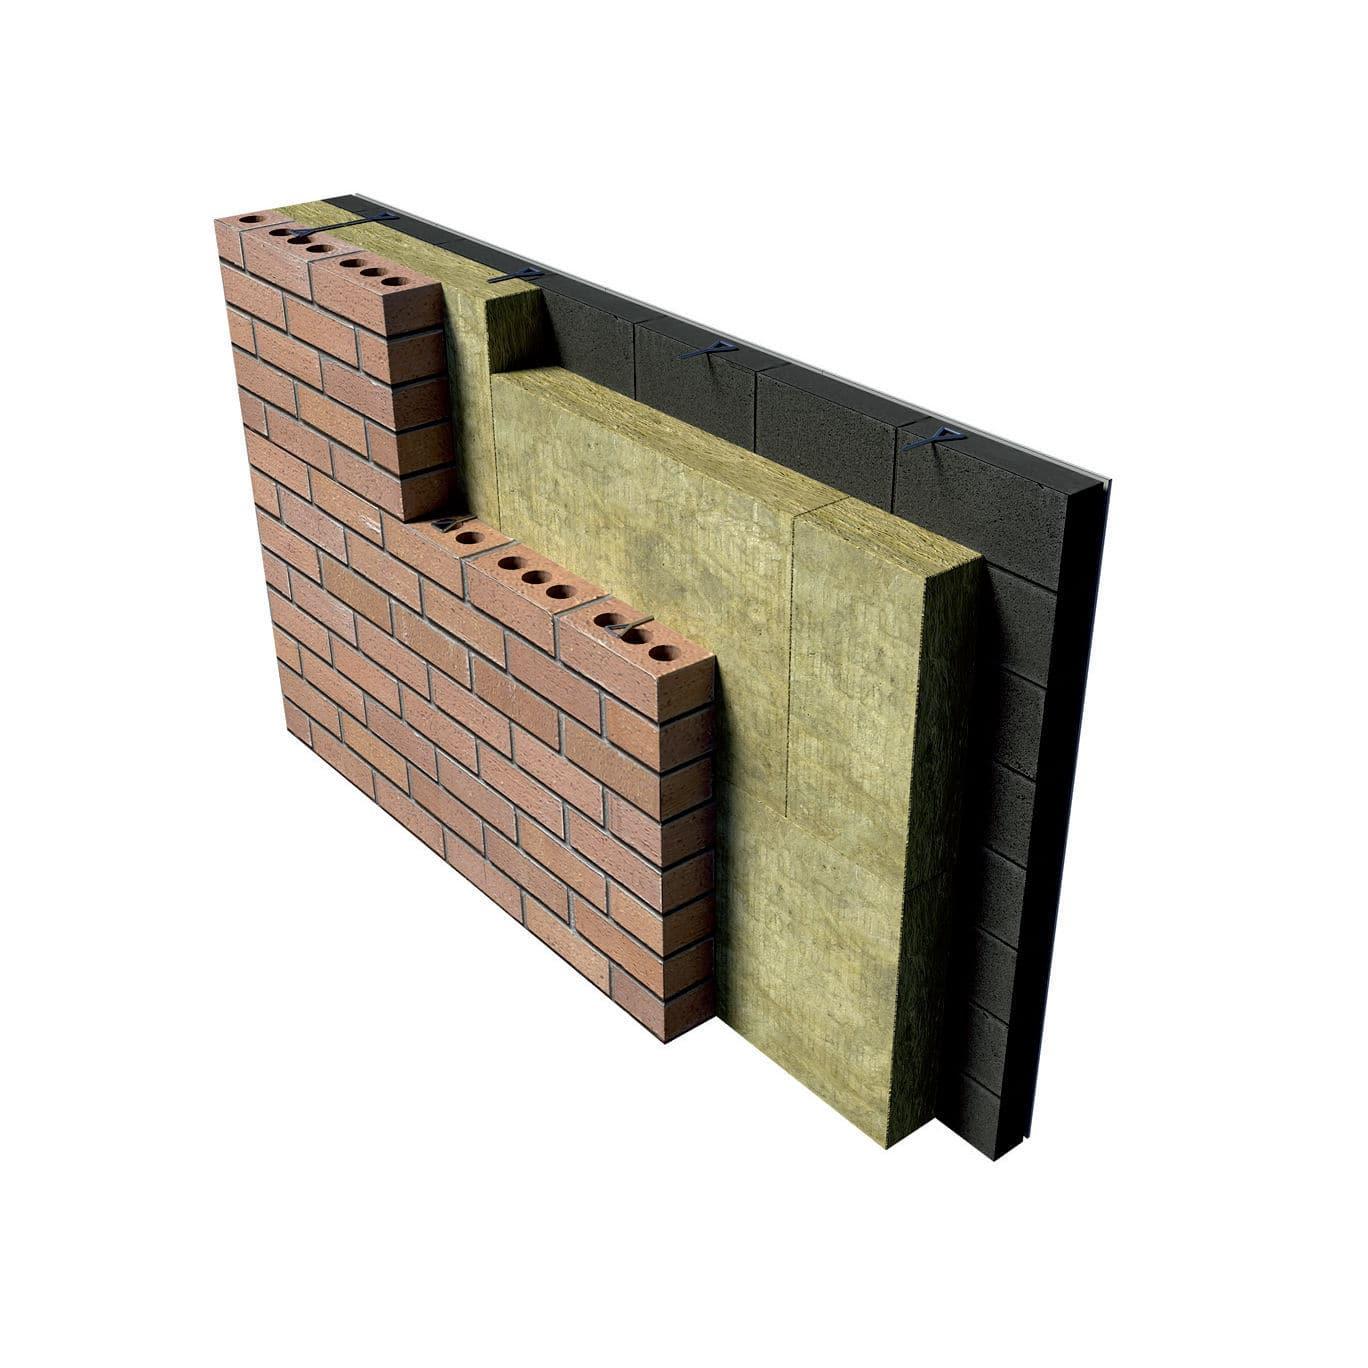 Thermal Insulation / Stone Wool / Interior / Wall   CAVITY BATT